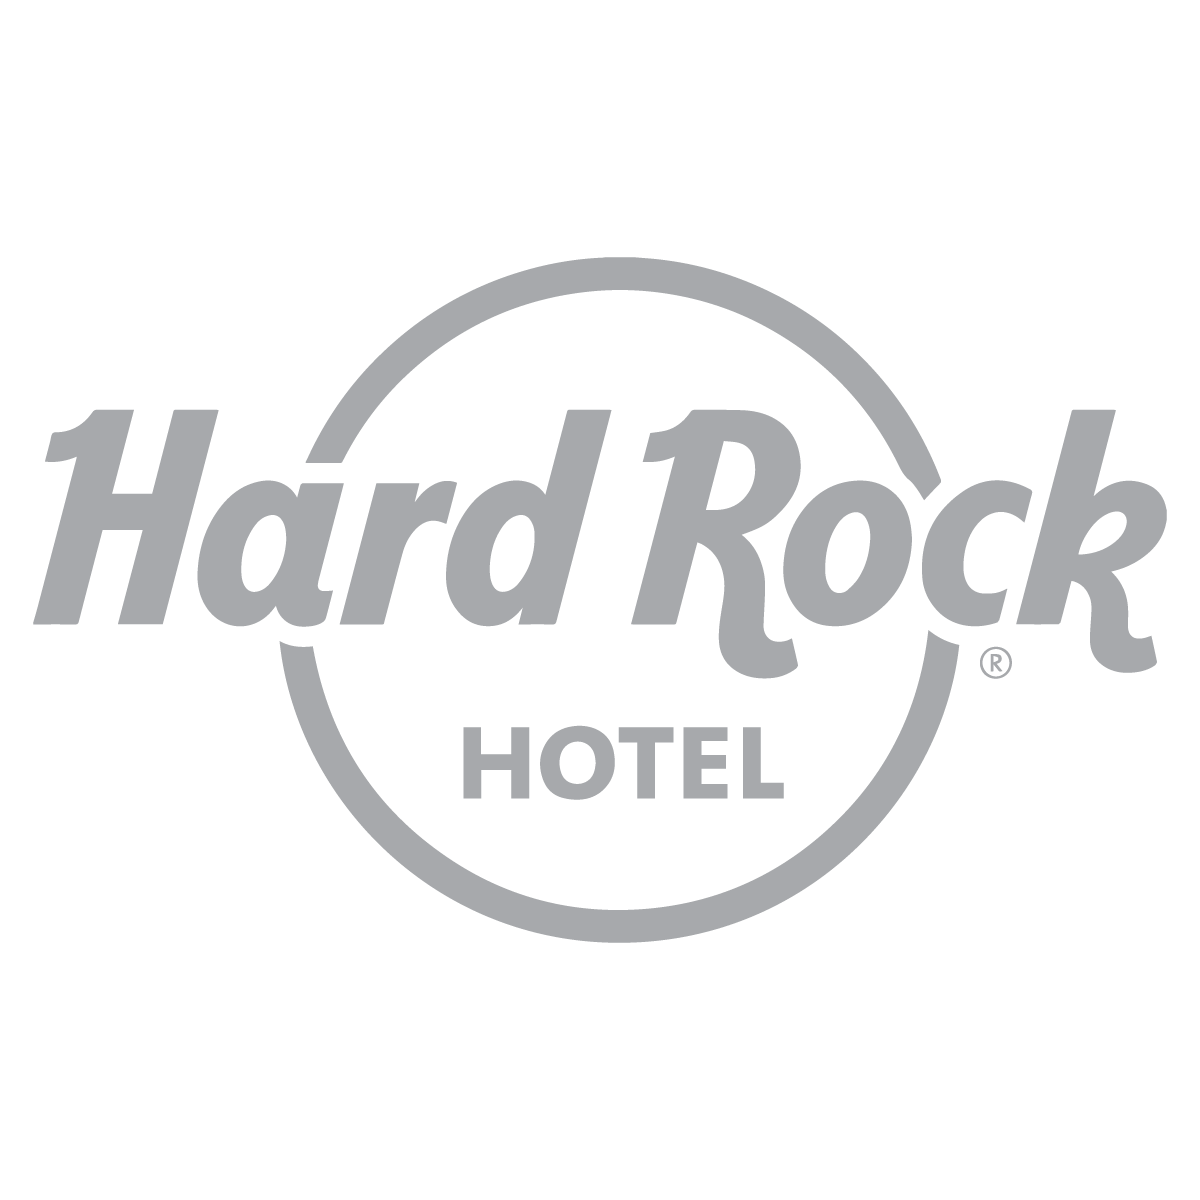 Hardrock-01